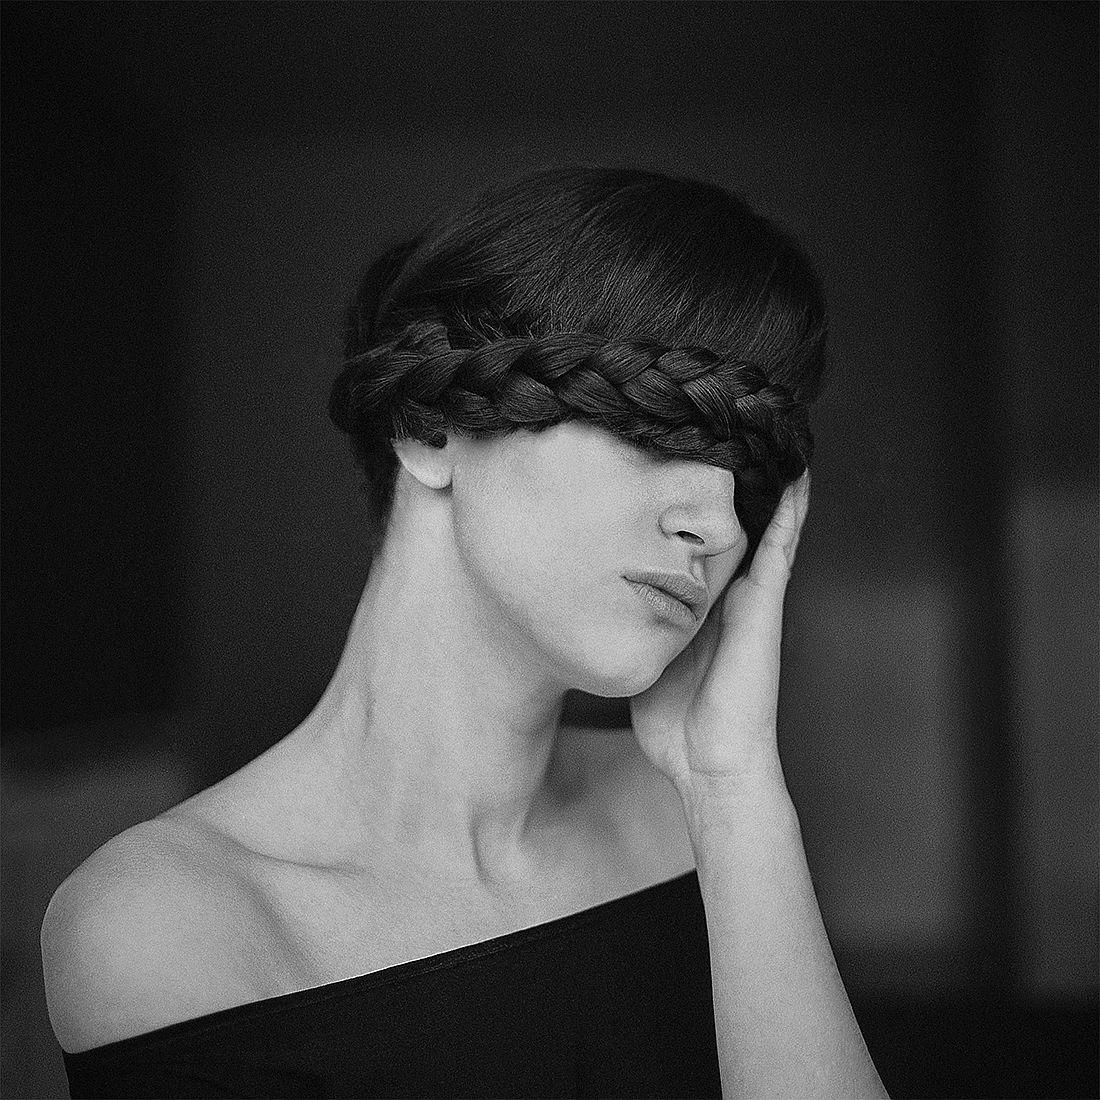 rafal-kazmierczak-nude-portrait-photographer-15